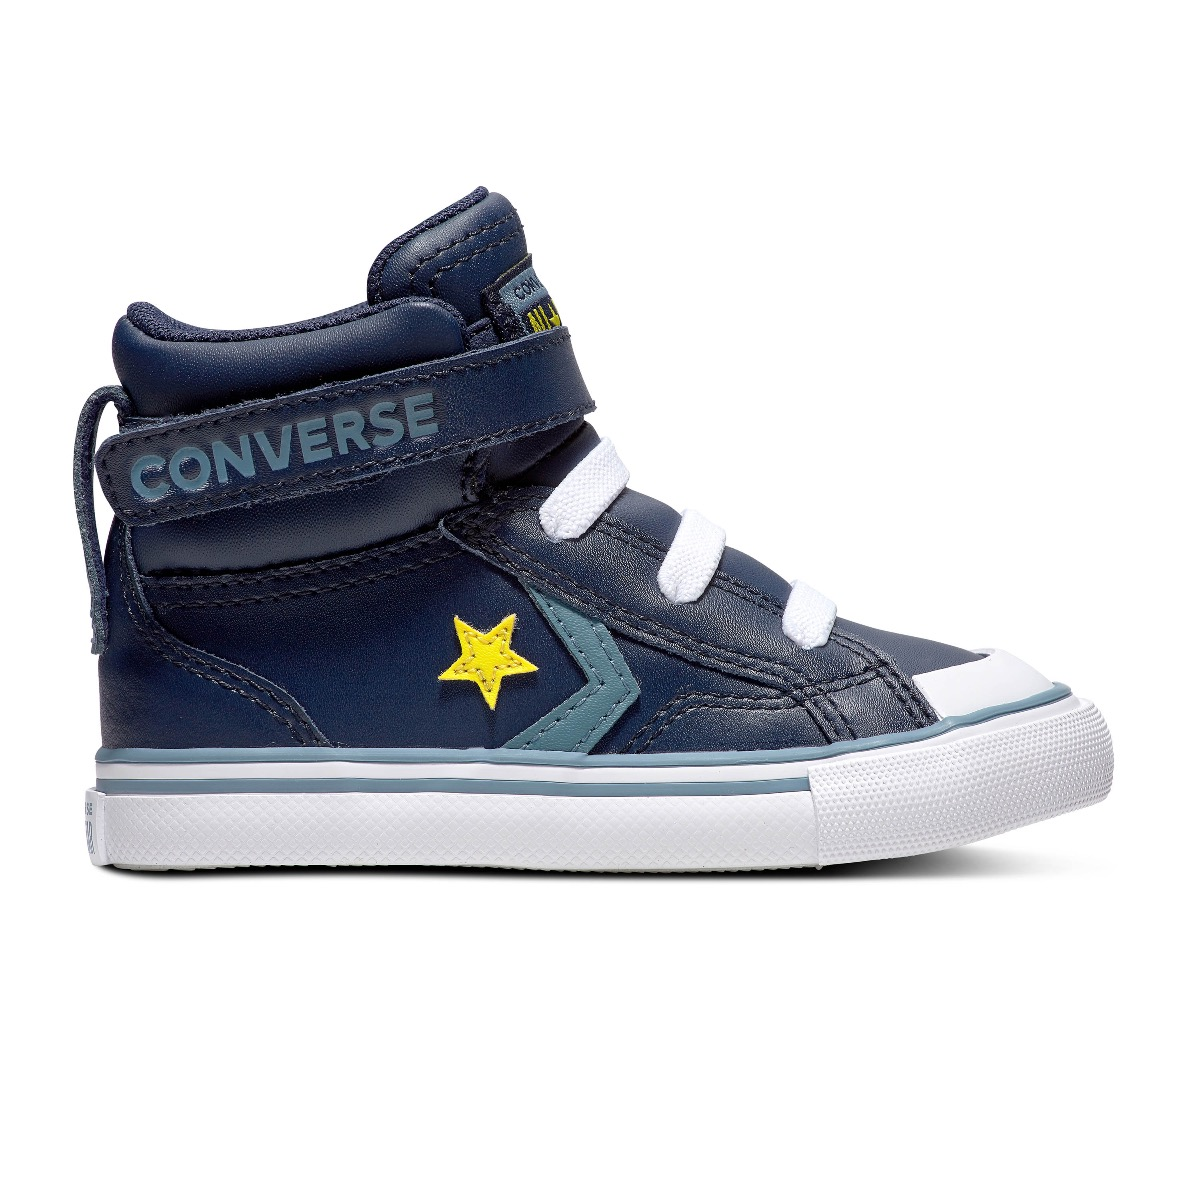 Converse All Stars Pro Blaze Strap 763531C Blauw-21